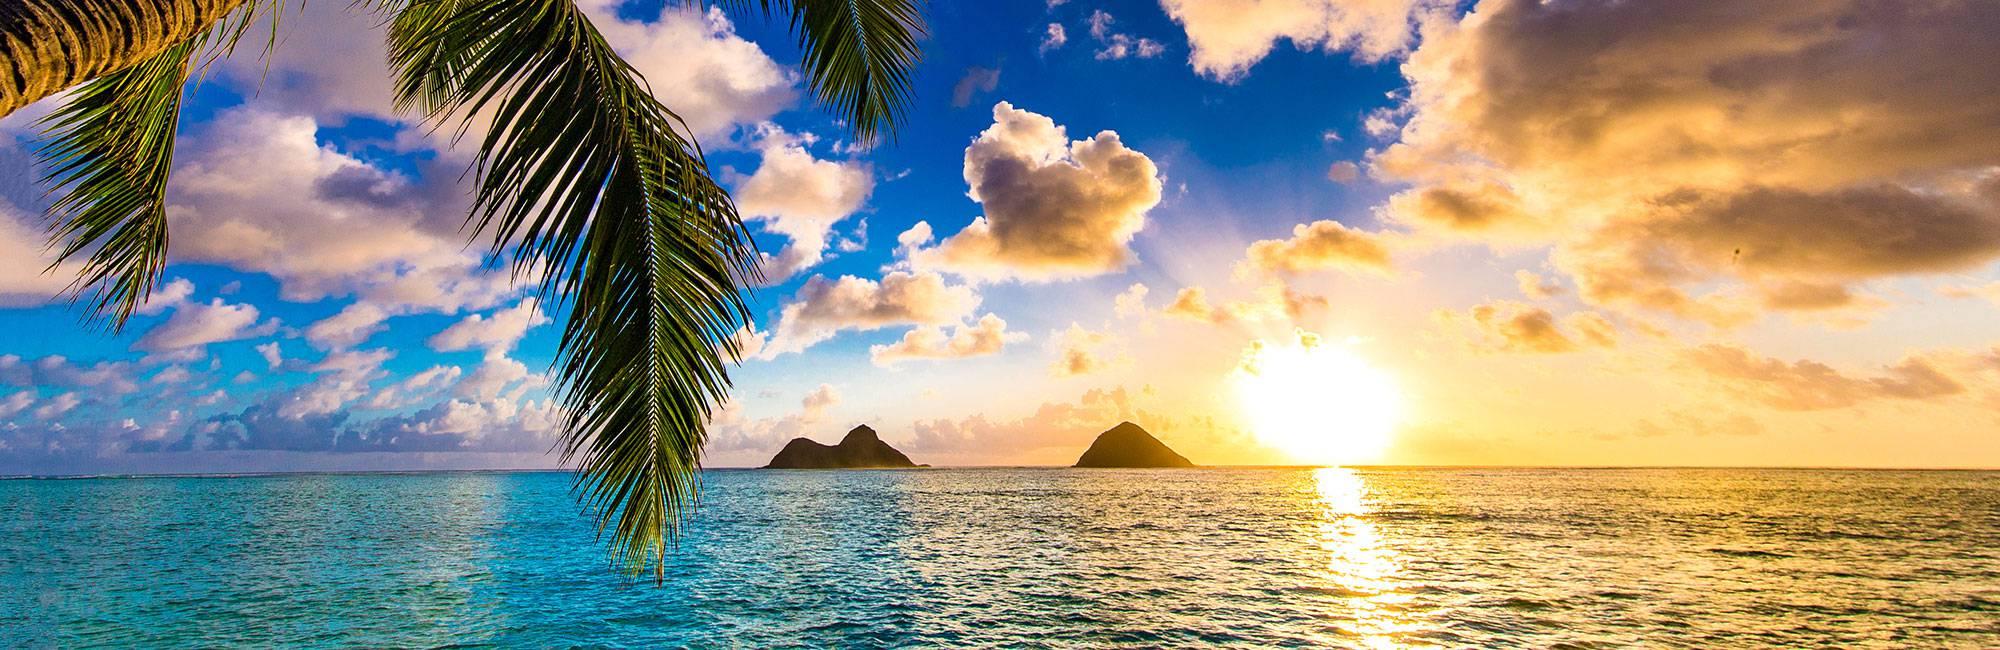 hawaiiの景色